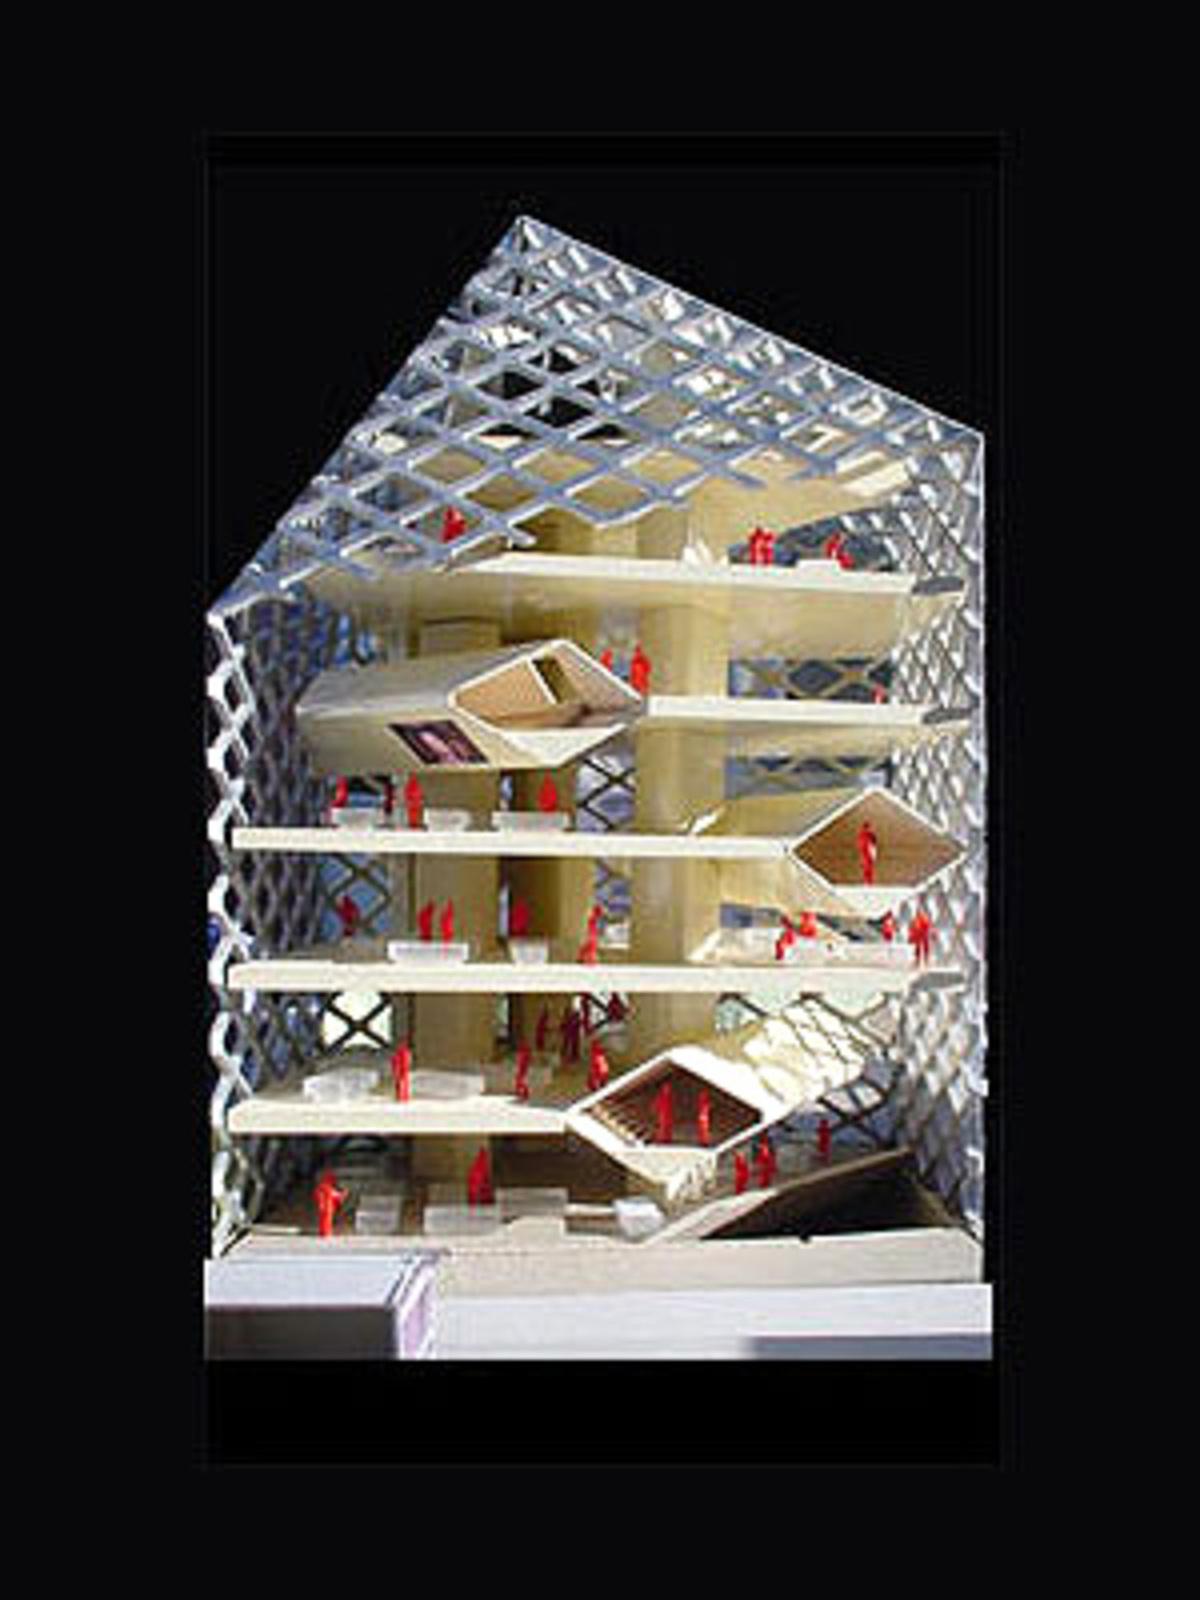 Epicentro Prada A Tokyo Herzog Amp De Meuron 2003 Floornature